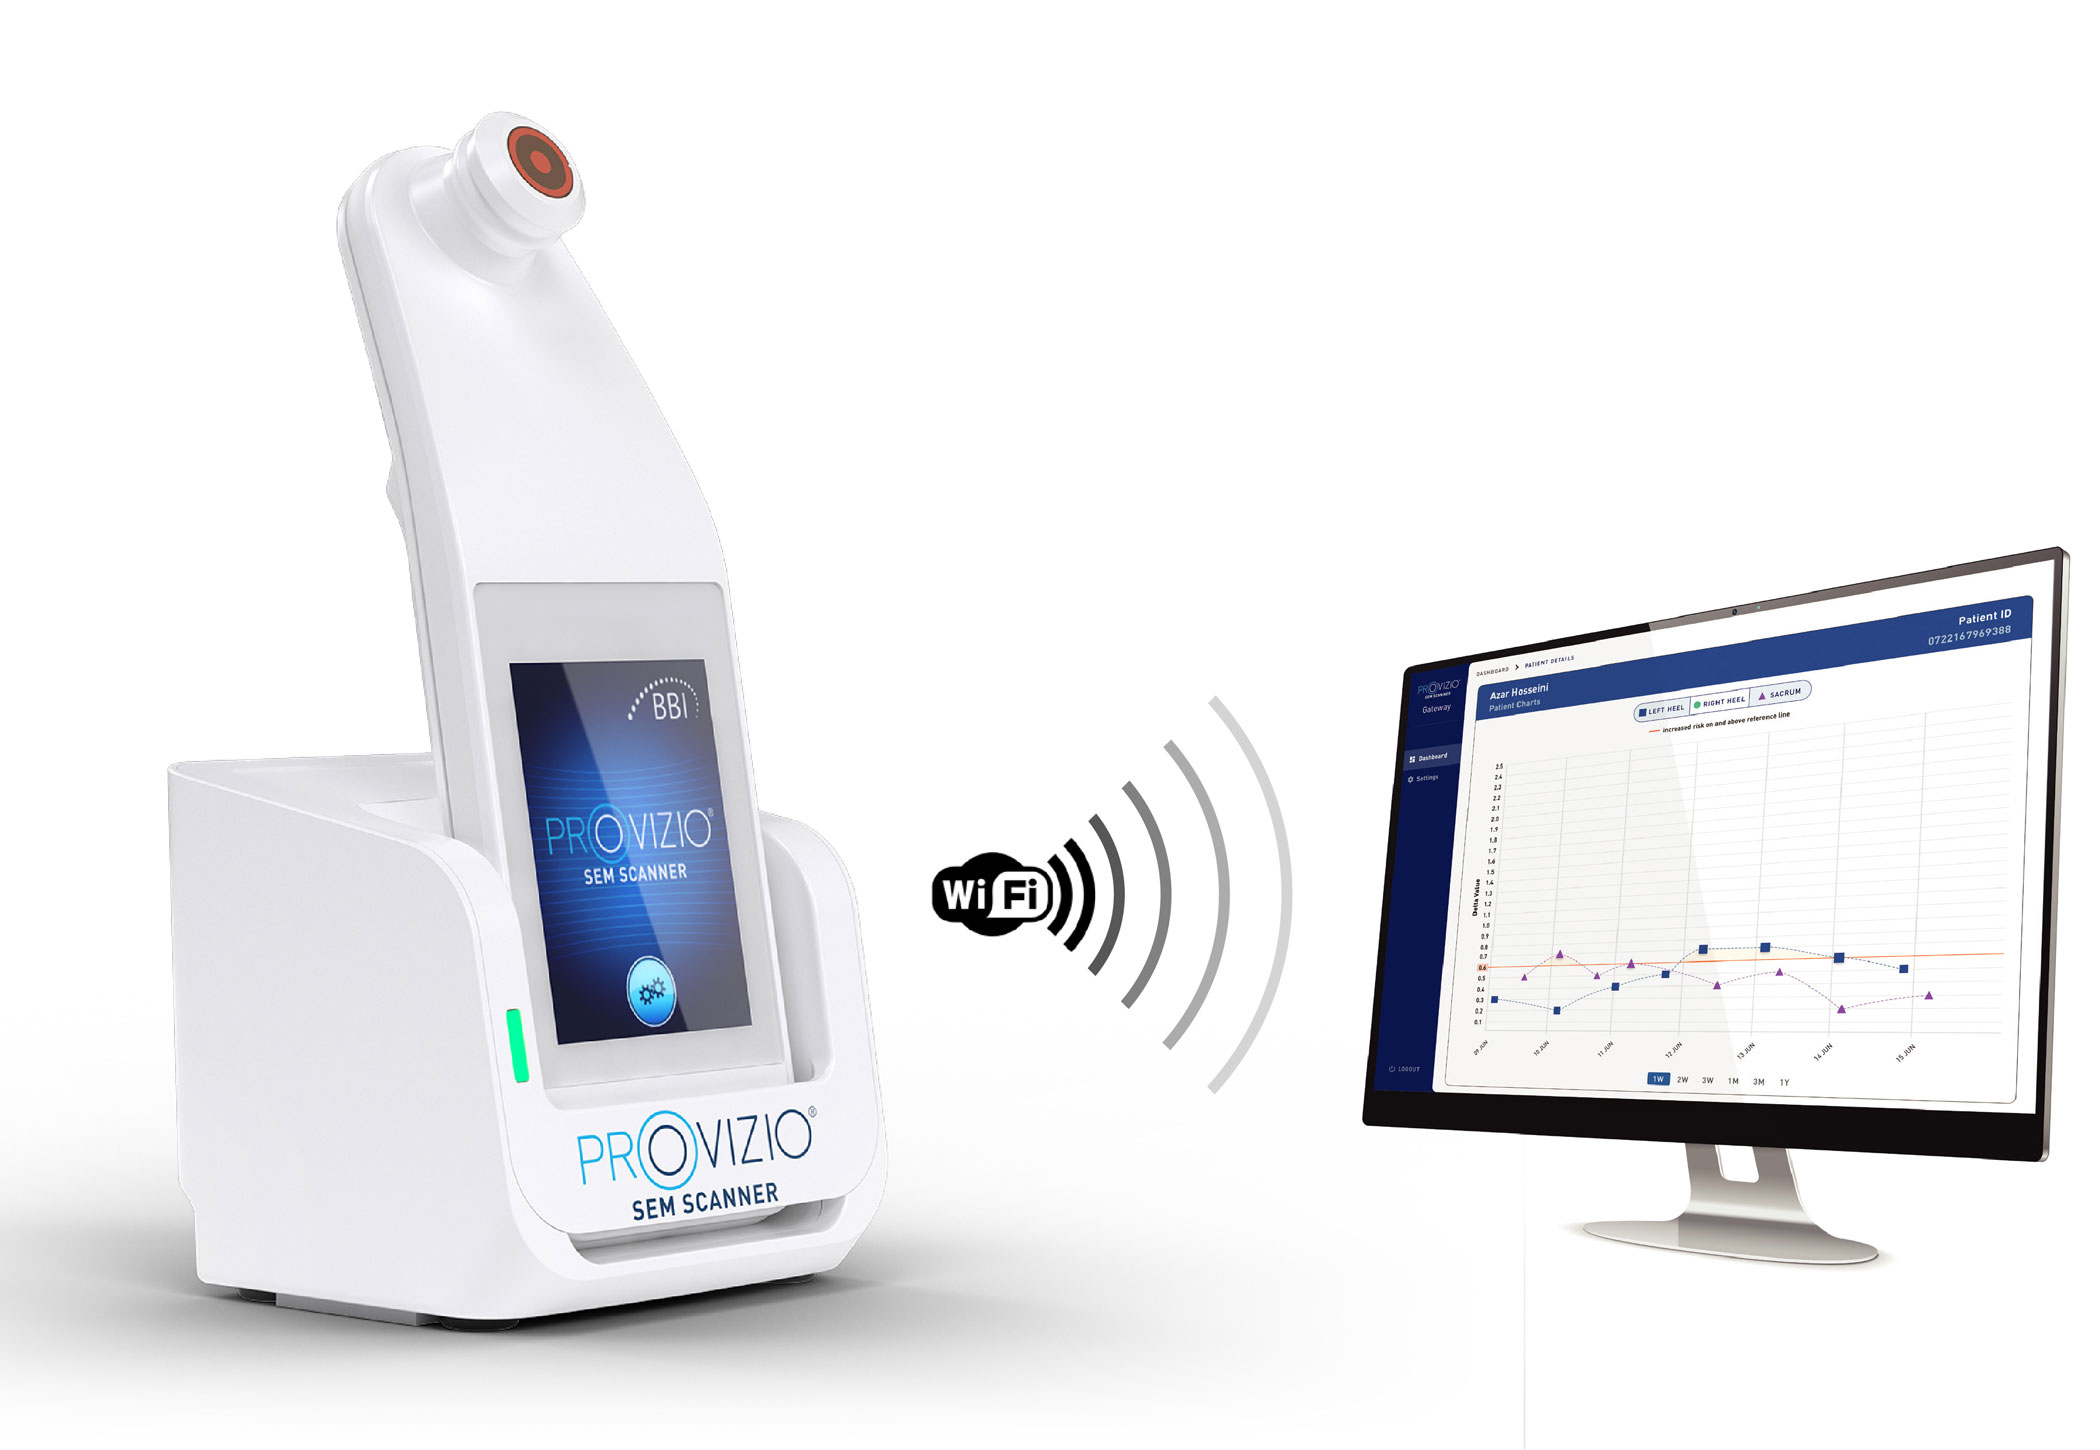 Provizio SEM Scanner transmitting data to computer screen